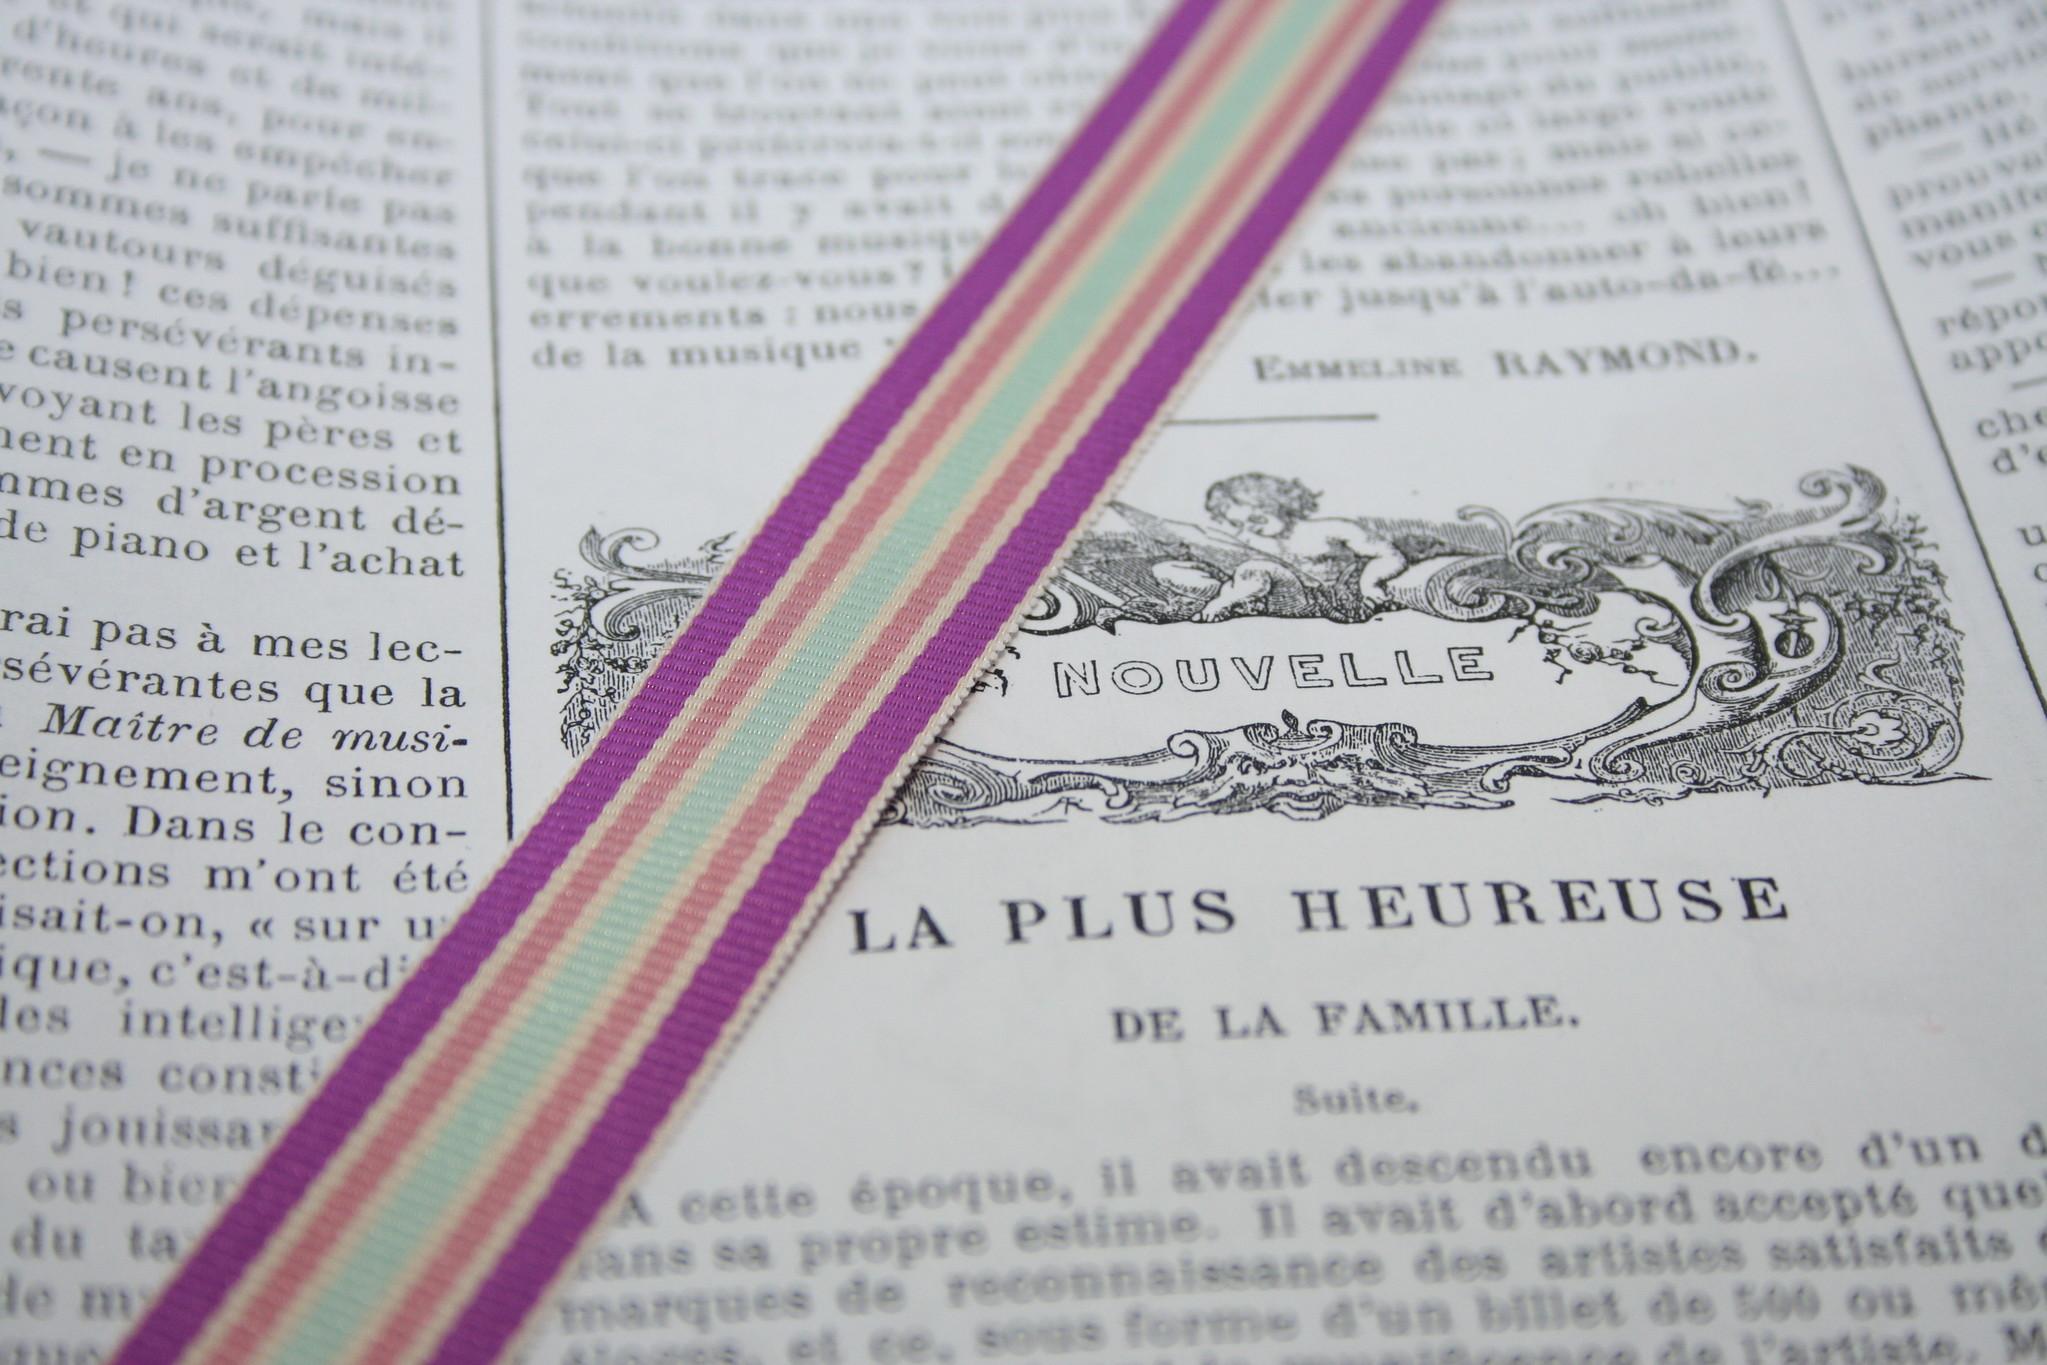 Striped ribbon, 3 colors diff. colors